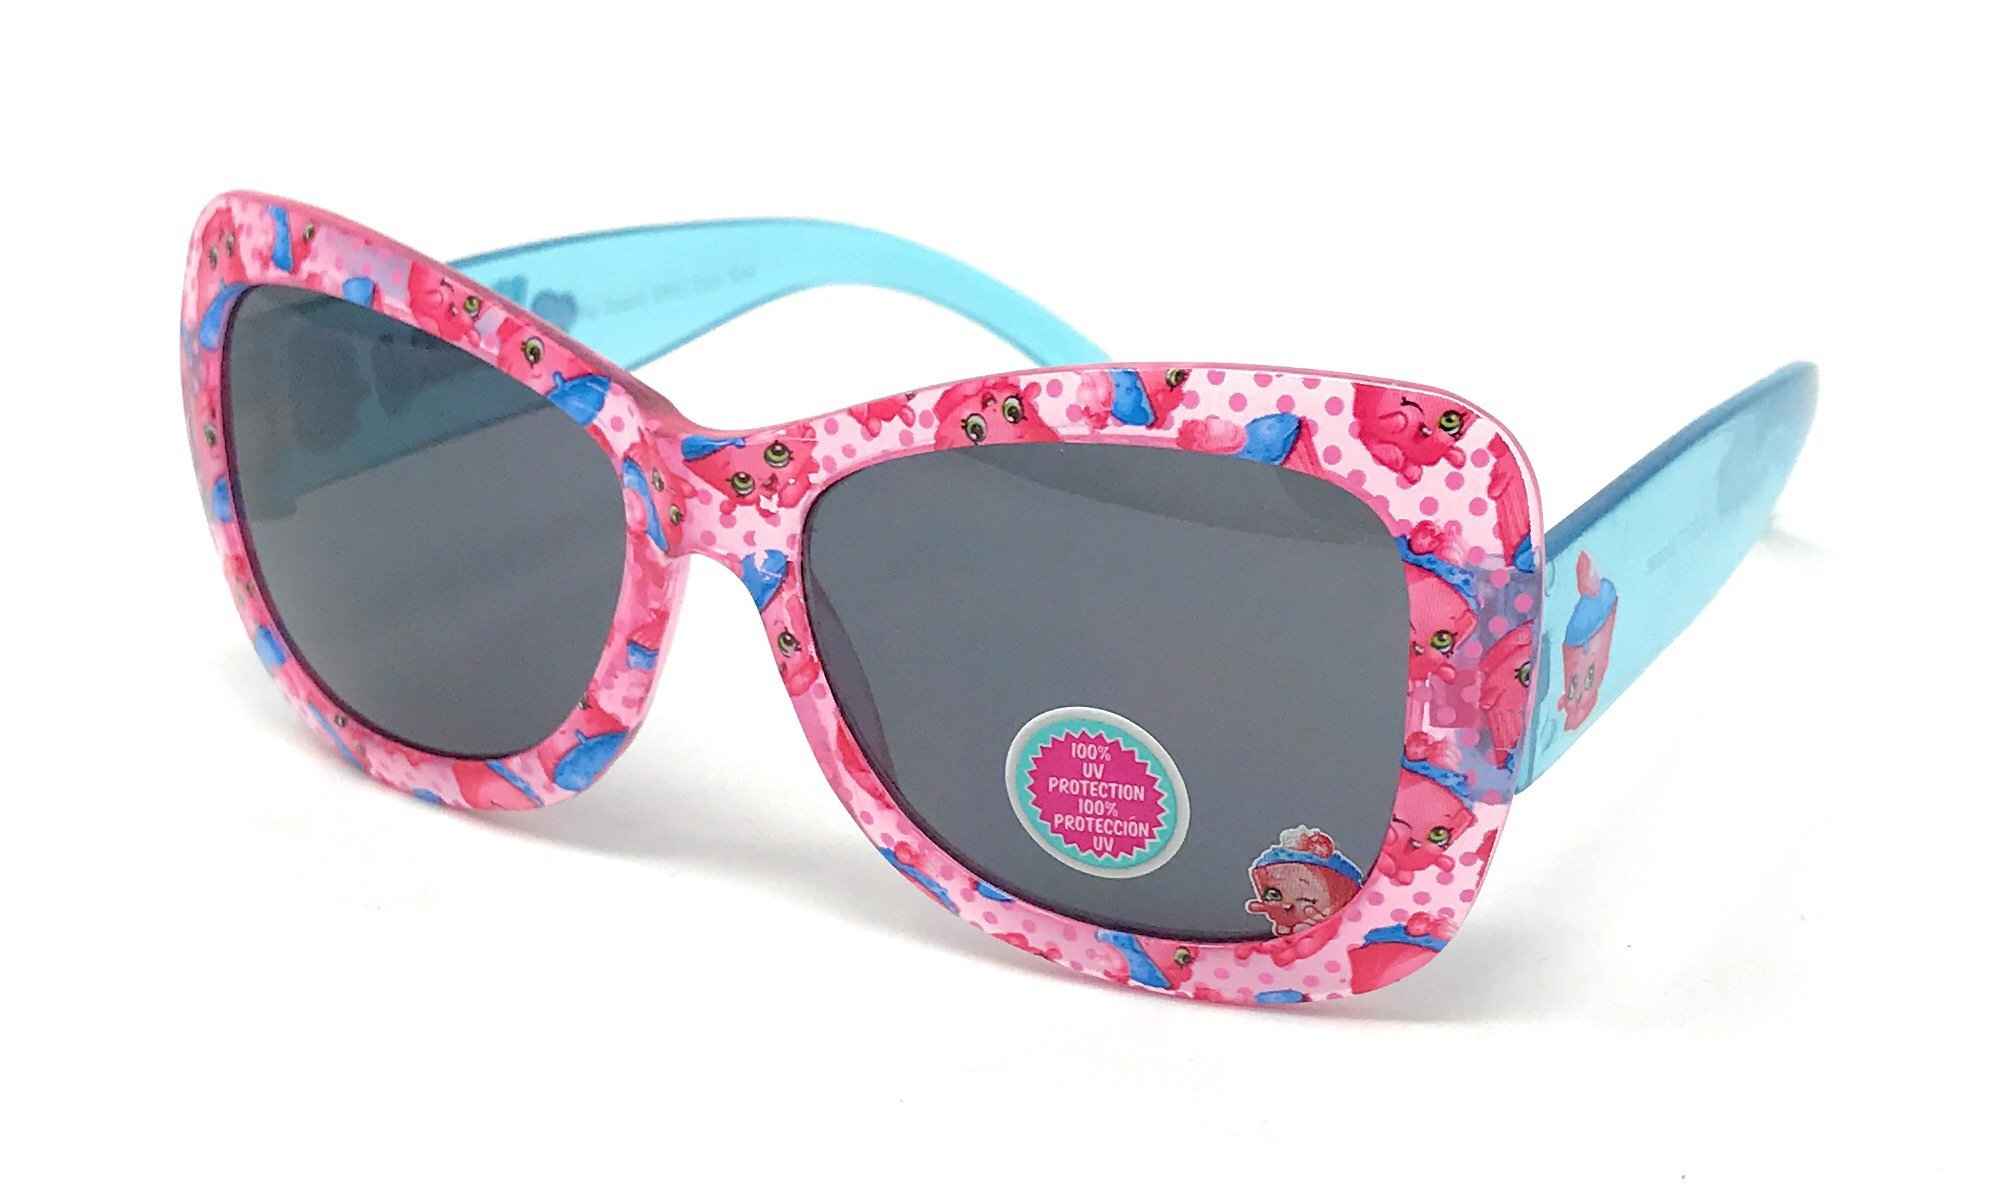 Shopkins Cupcake Chic Girl's Sunglasses - Worn in Logan Movie Rare Collectible